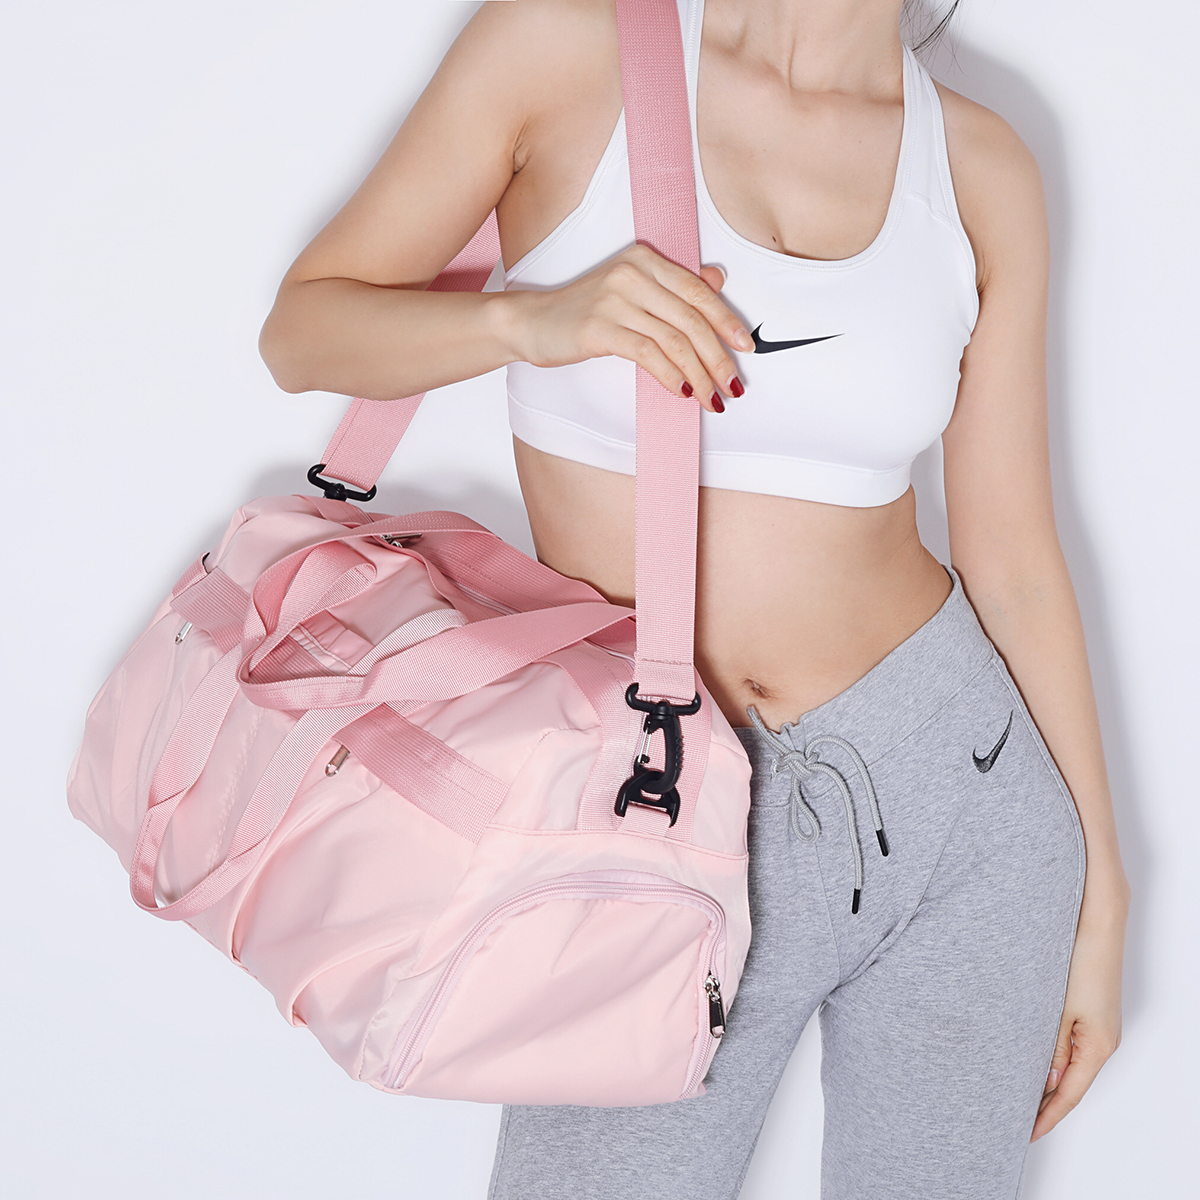 Top nylon Travel Handbag Carry on Luggage Shoulder Bags Men Duffle Bags Women Travel Tote Large